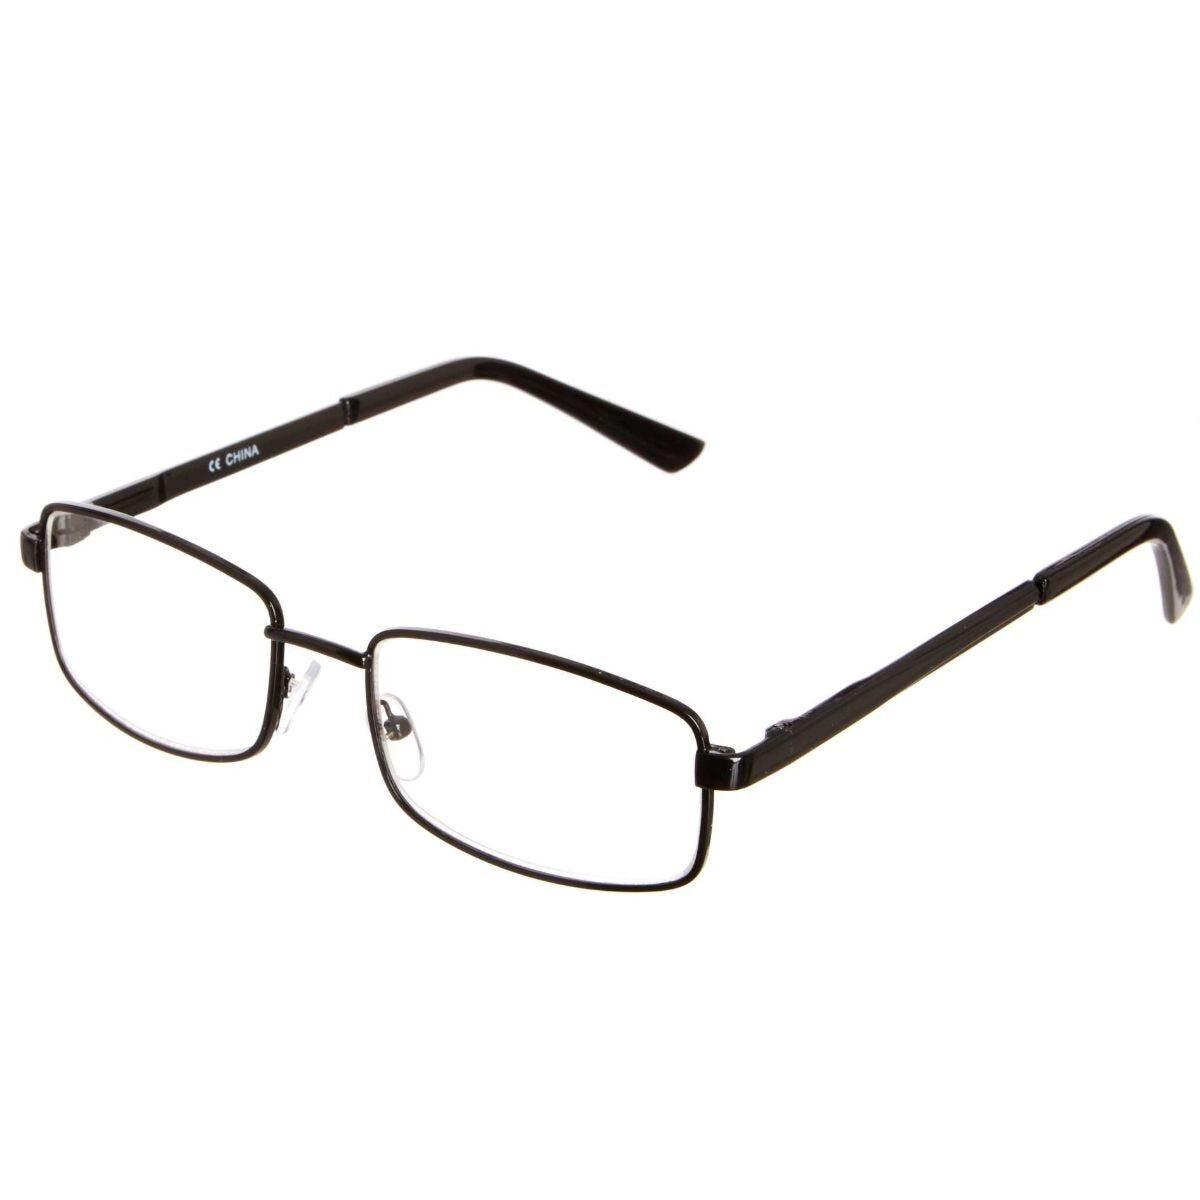 Ryman Reading Glasses + 1.0 Square Metal Frame